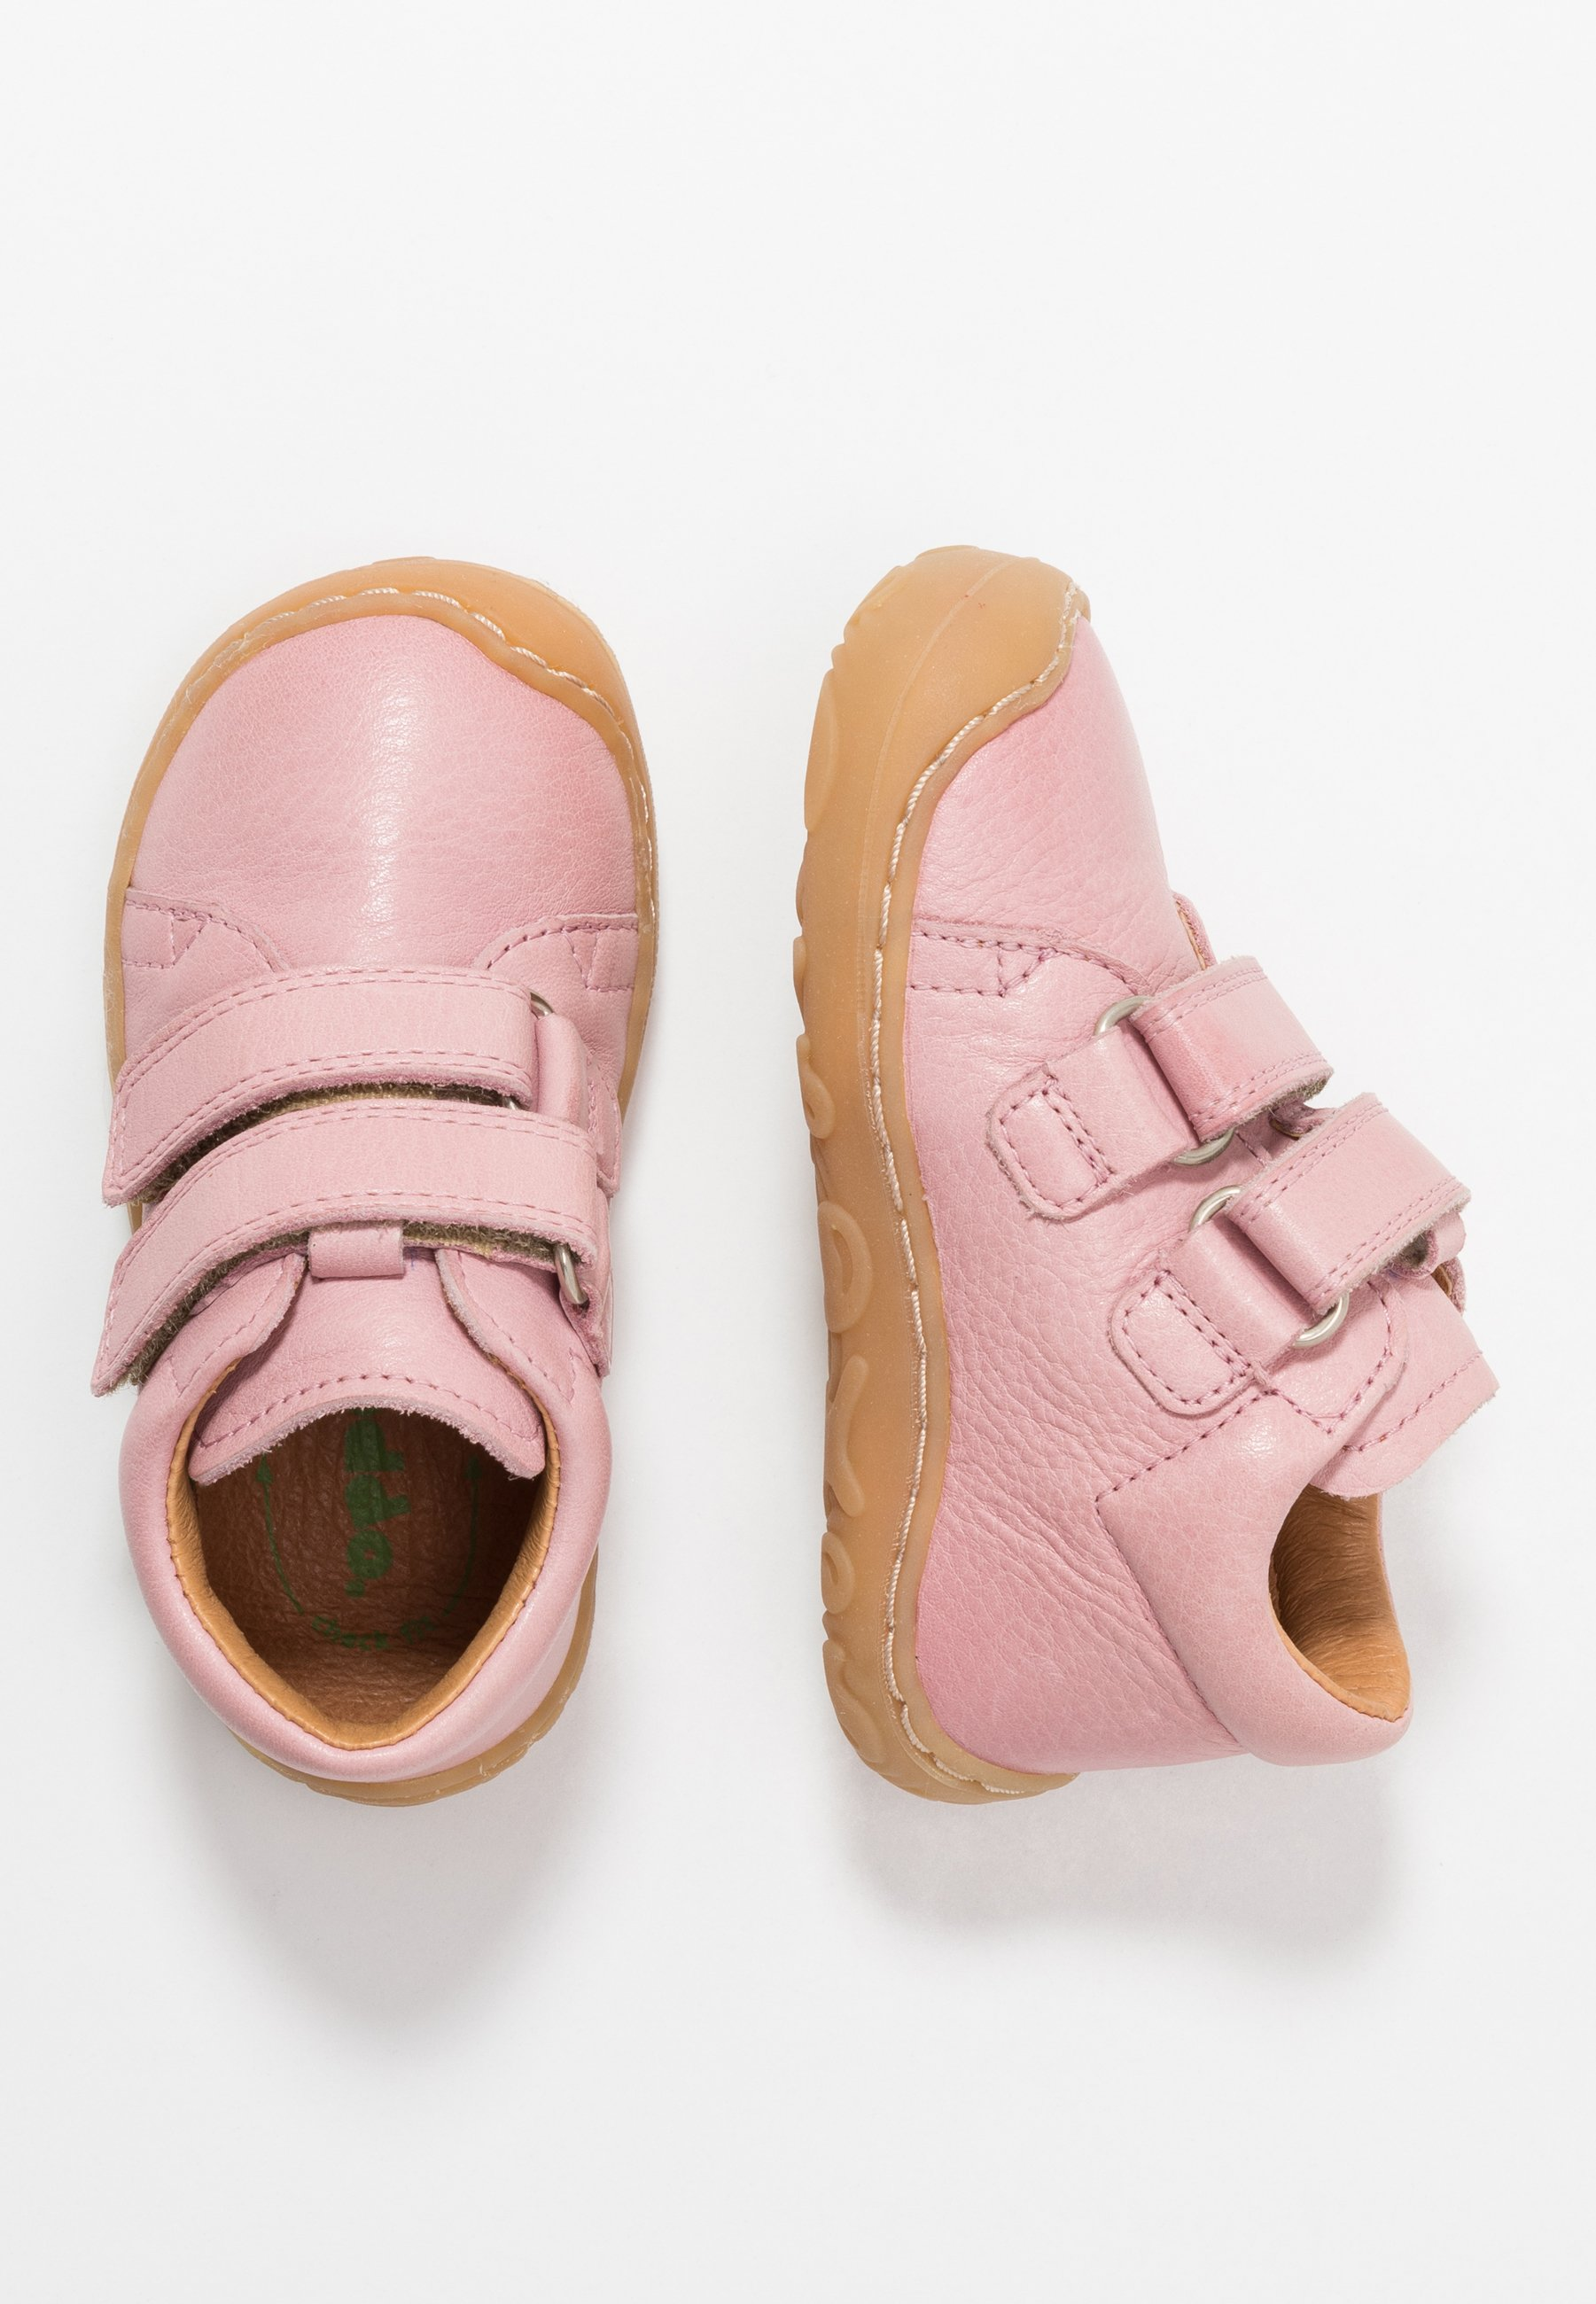 Froddo Vauvan kengät fuxia Zalando.fi